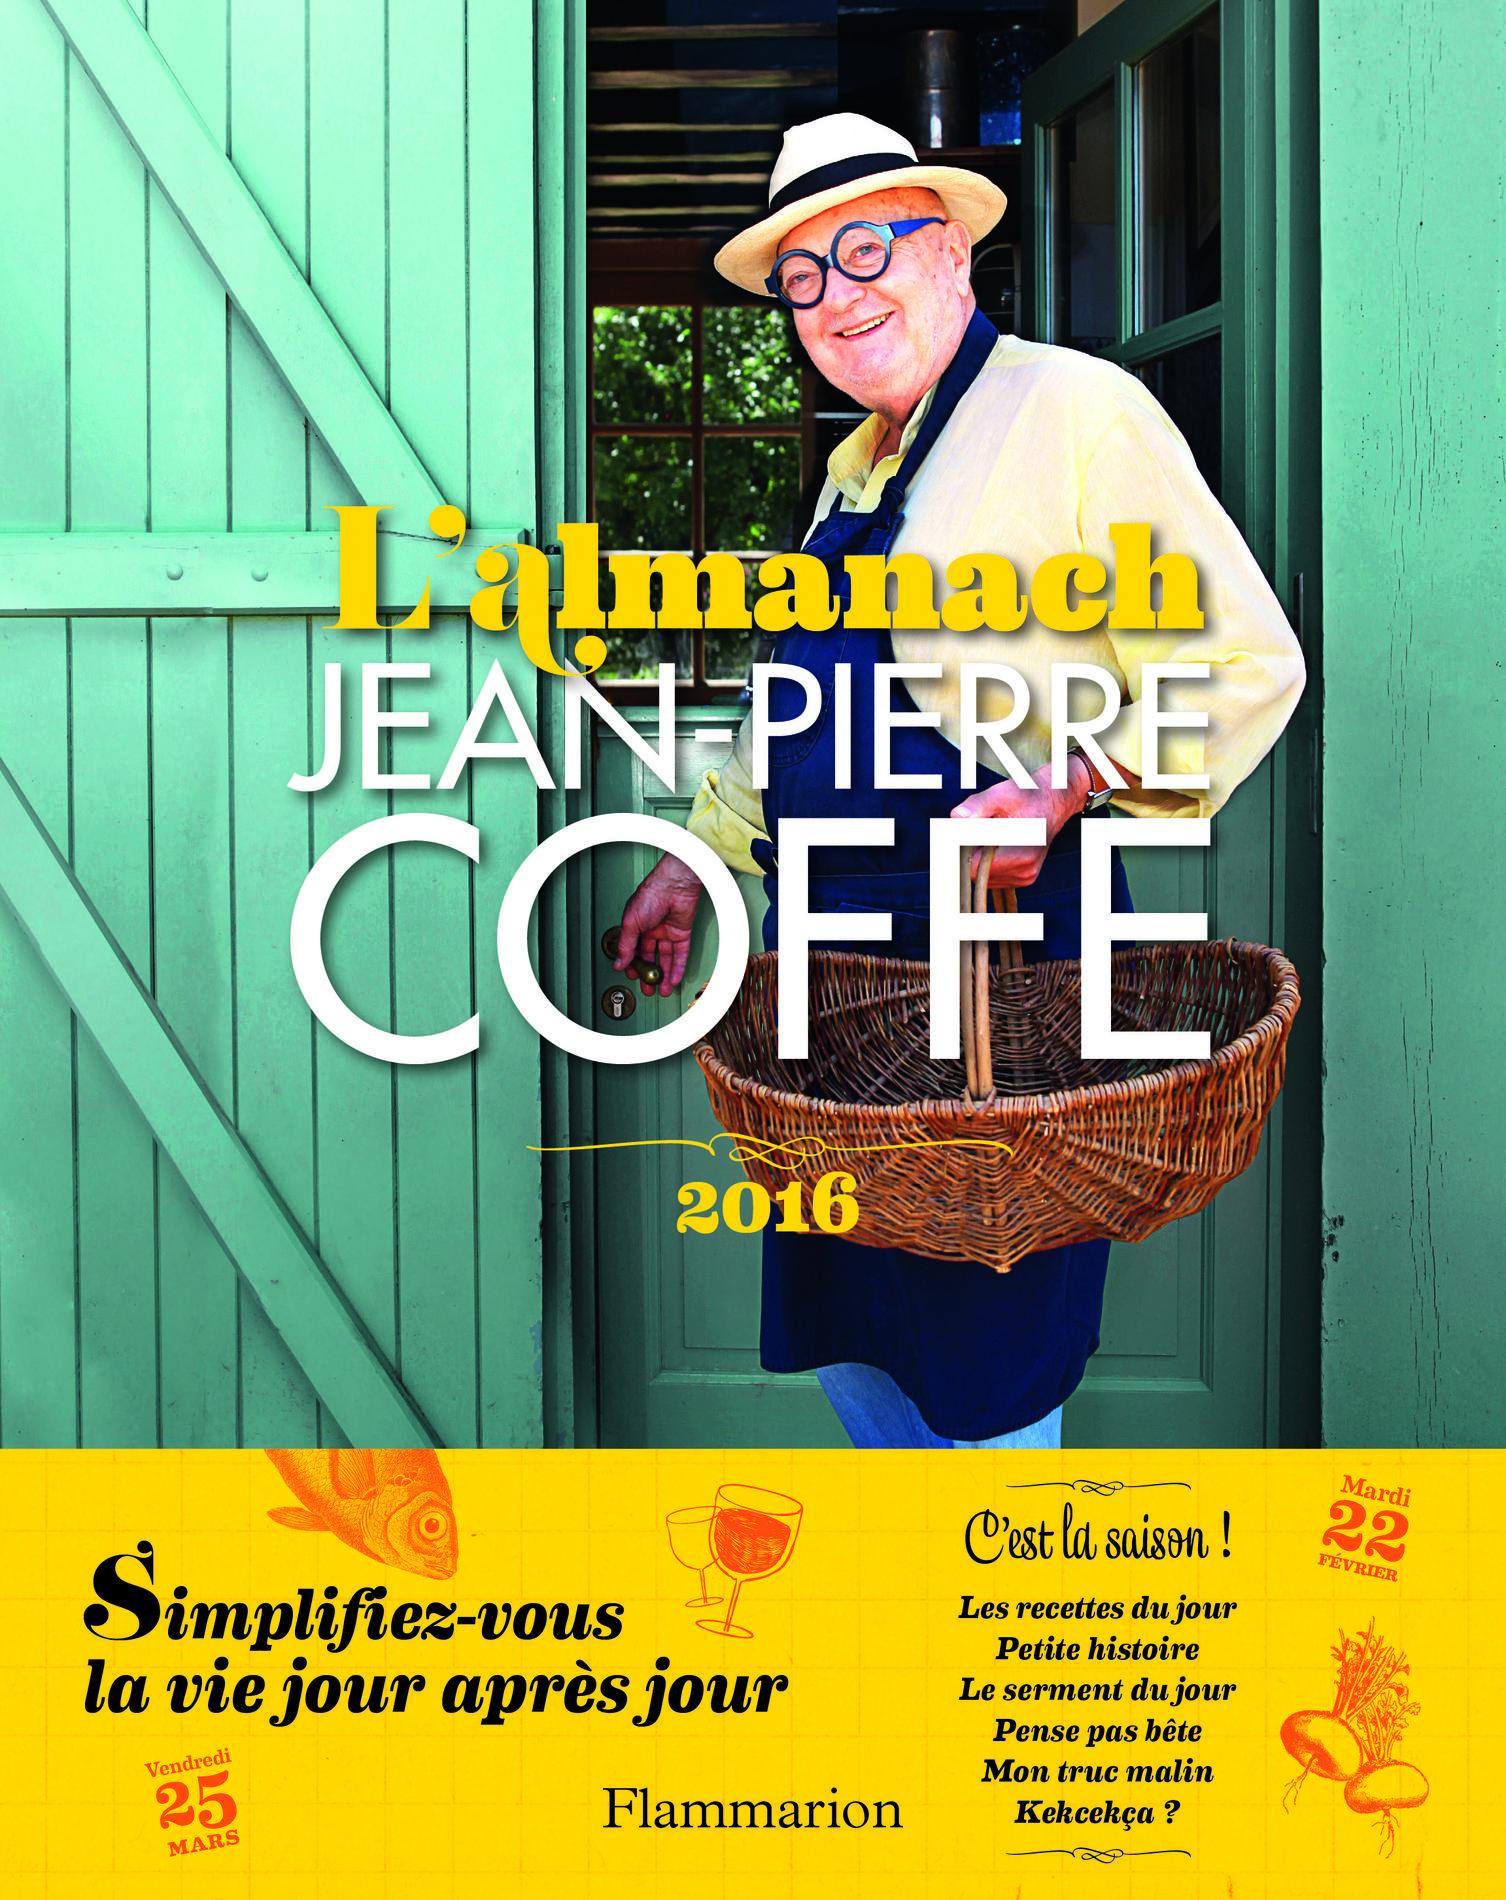 Les Dernieres Recettes De Jean Pierre Coffe Madame Figaro